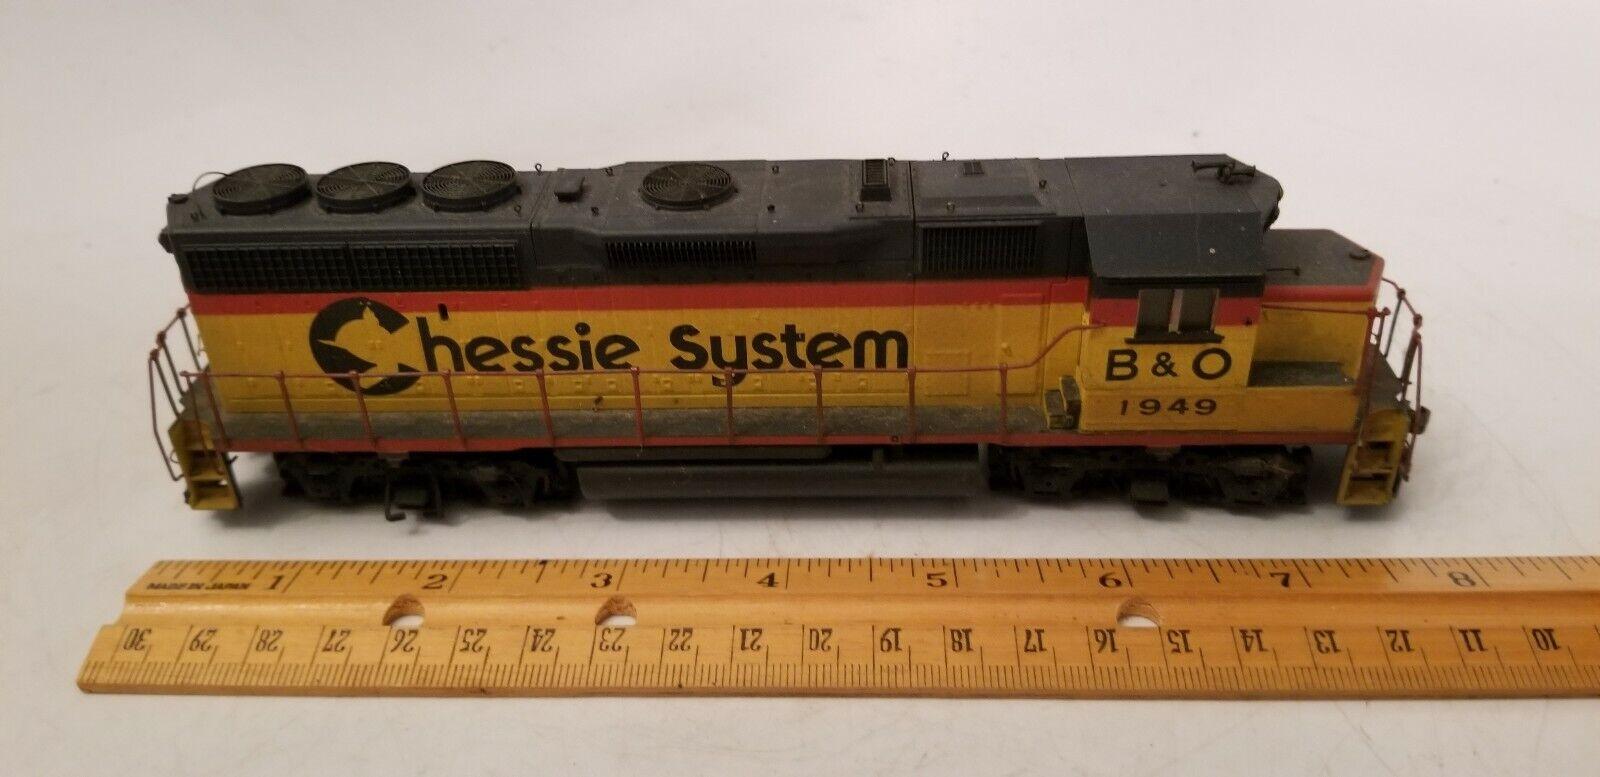 Chessie System Locomotive  B & O    Long